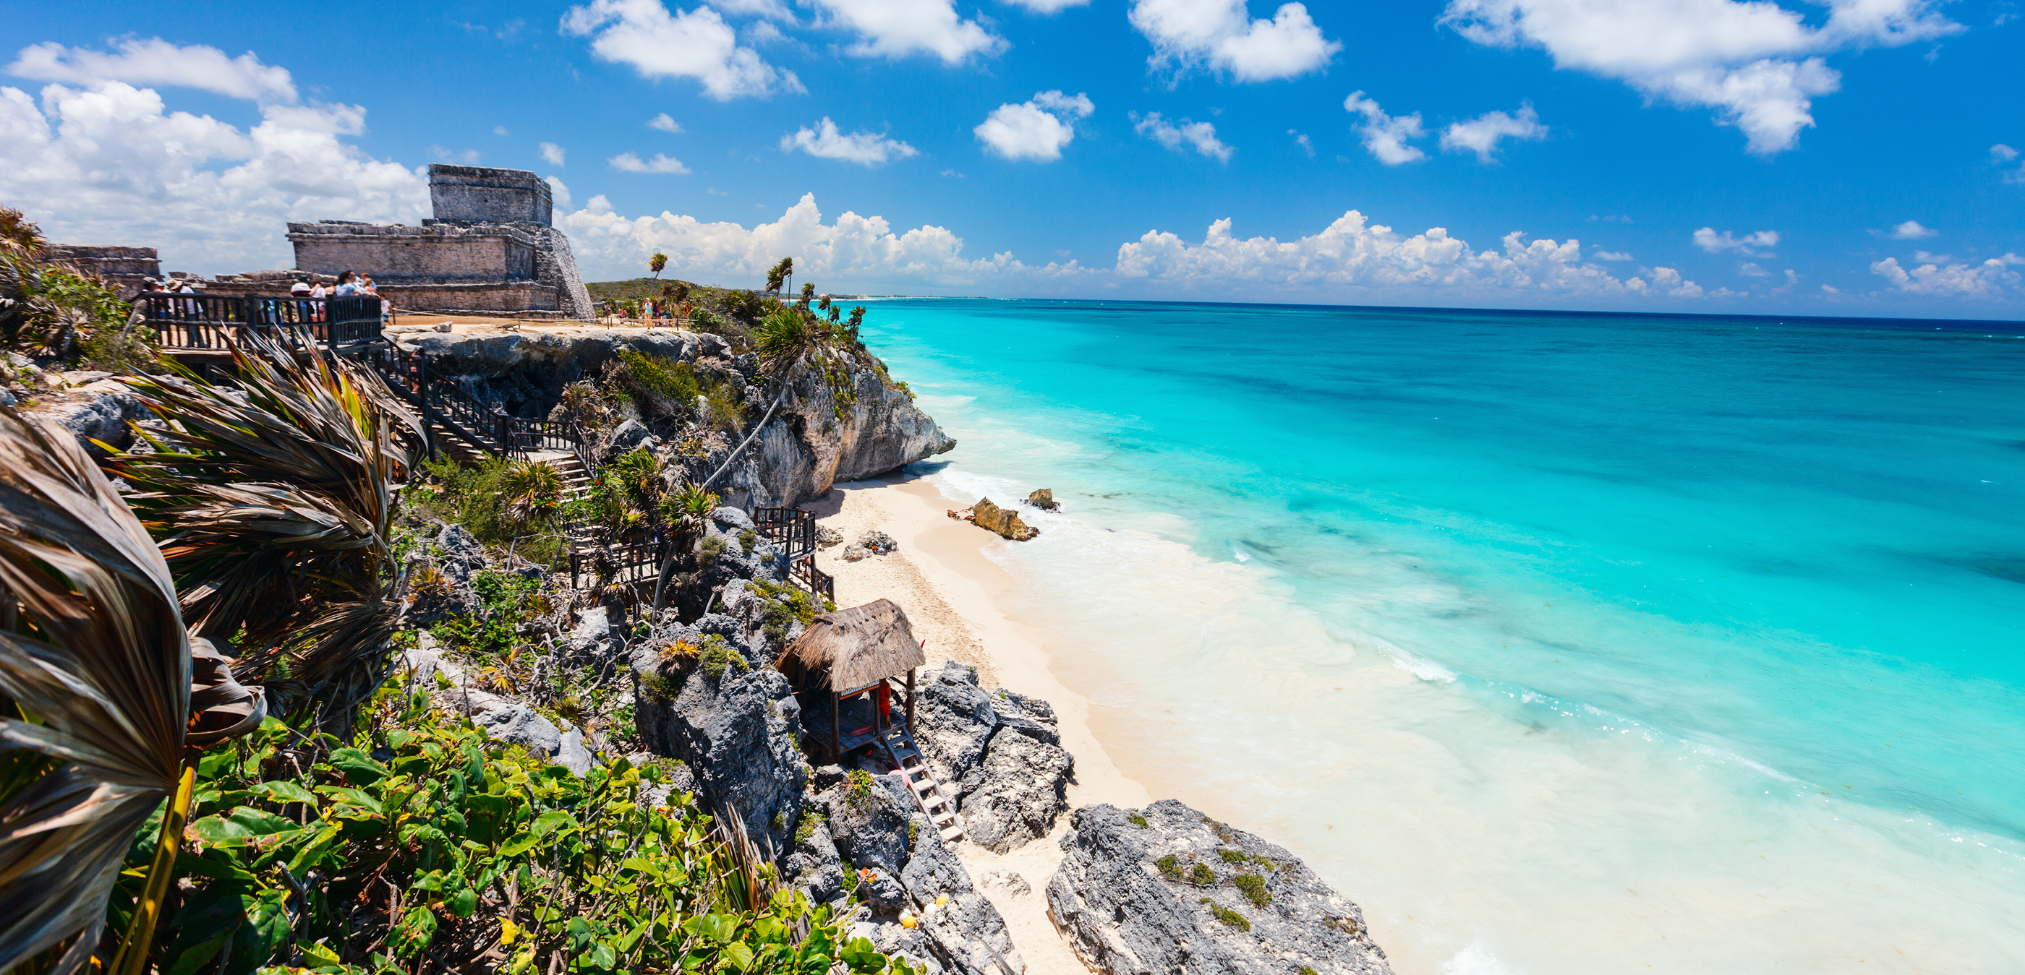 Tulum die schönsten Maya Ruinen in Mexiko